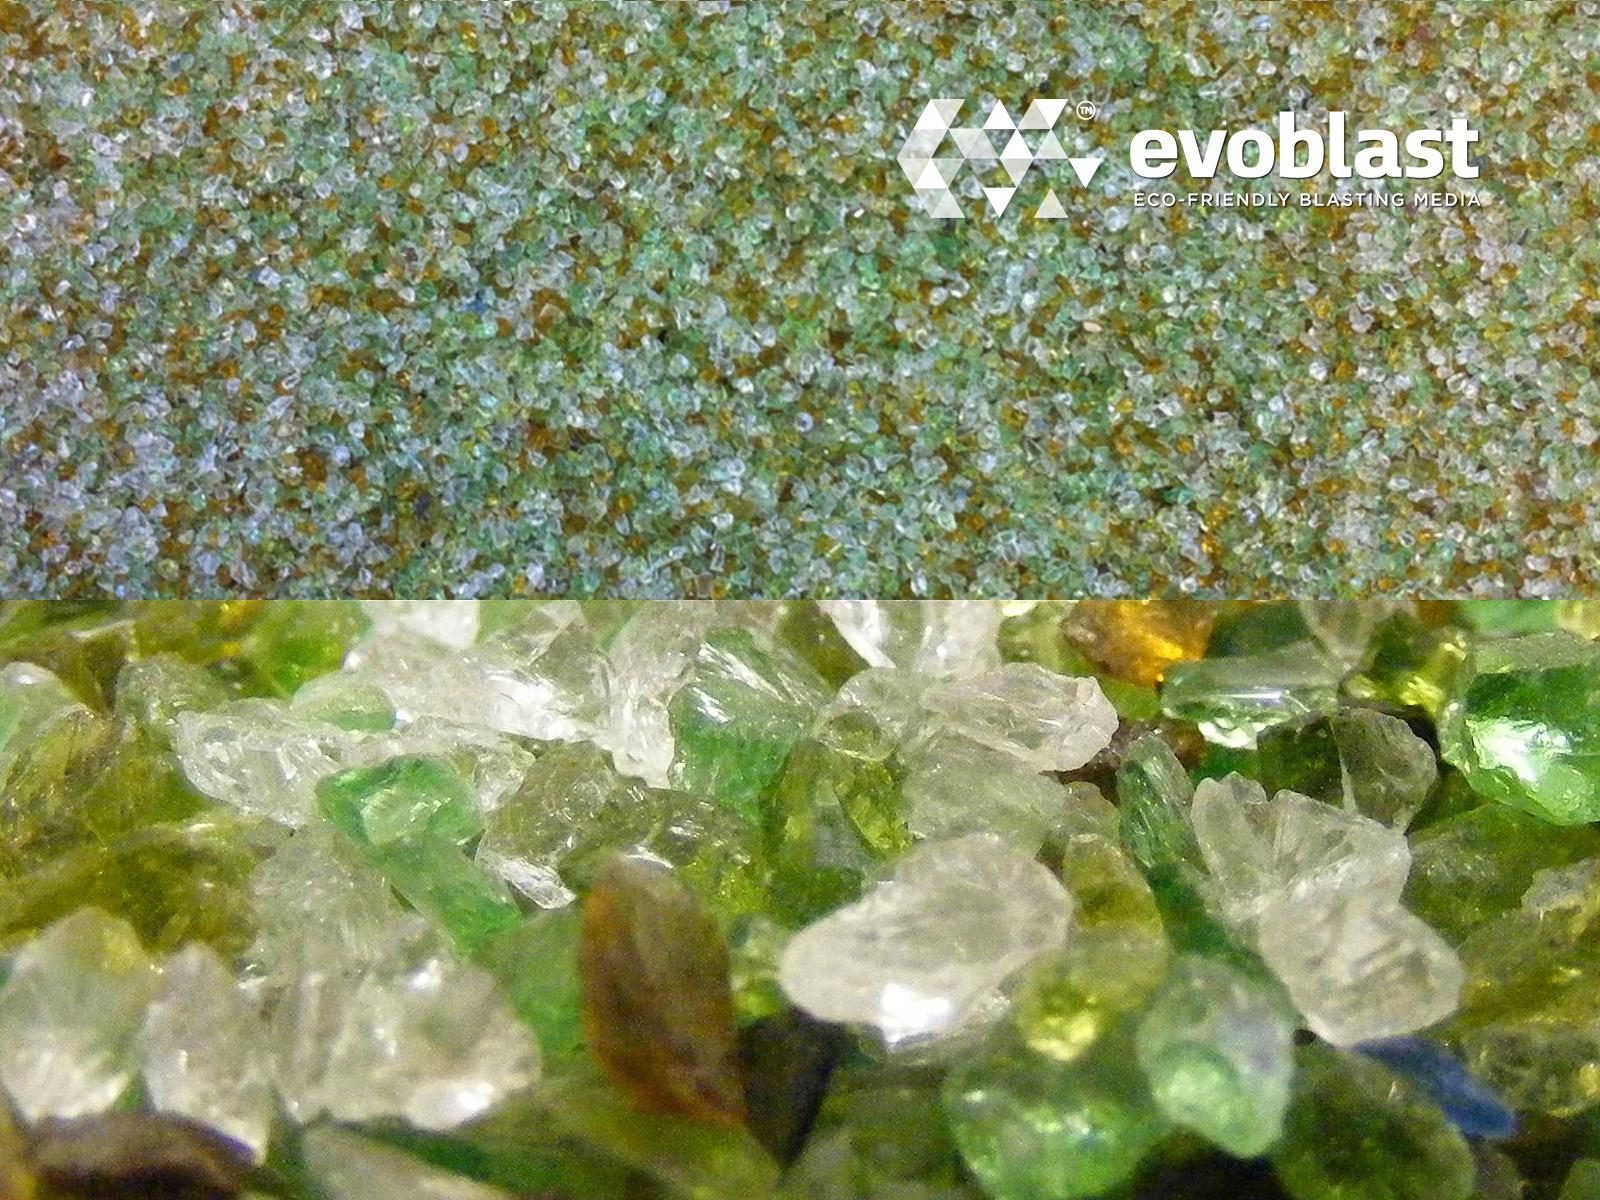 recycled glass media evoblast